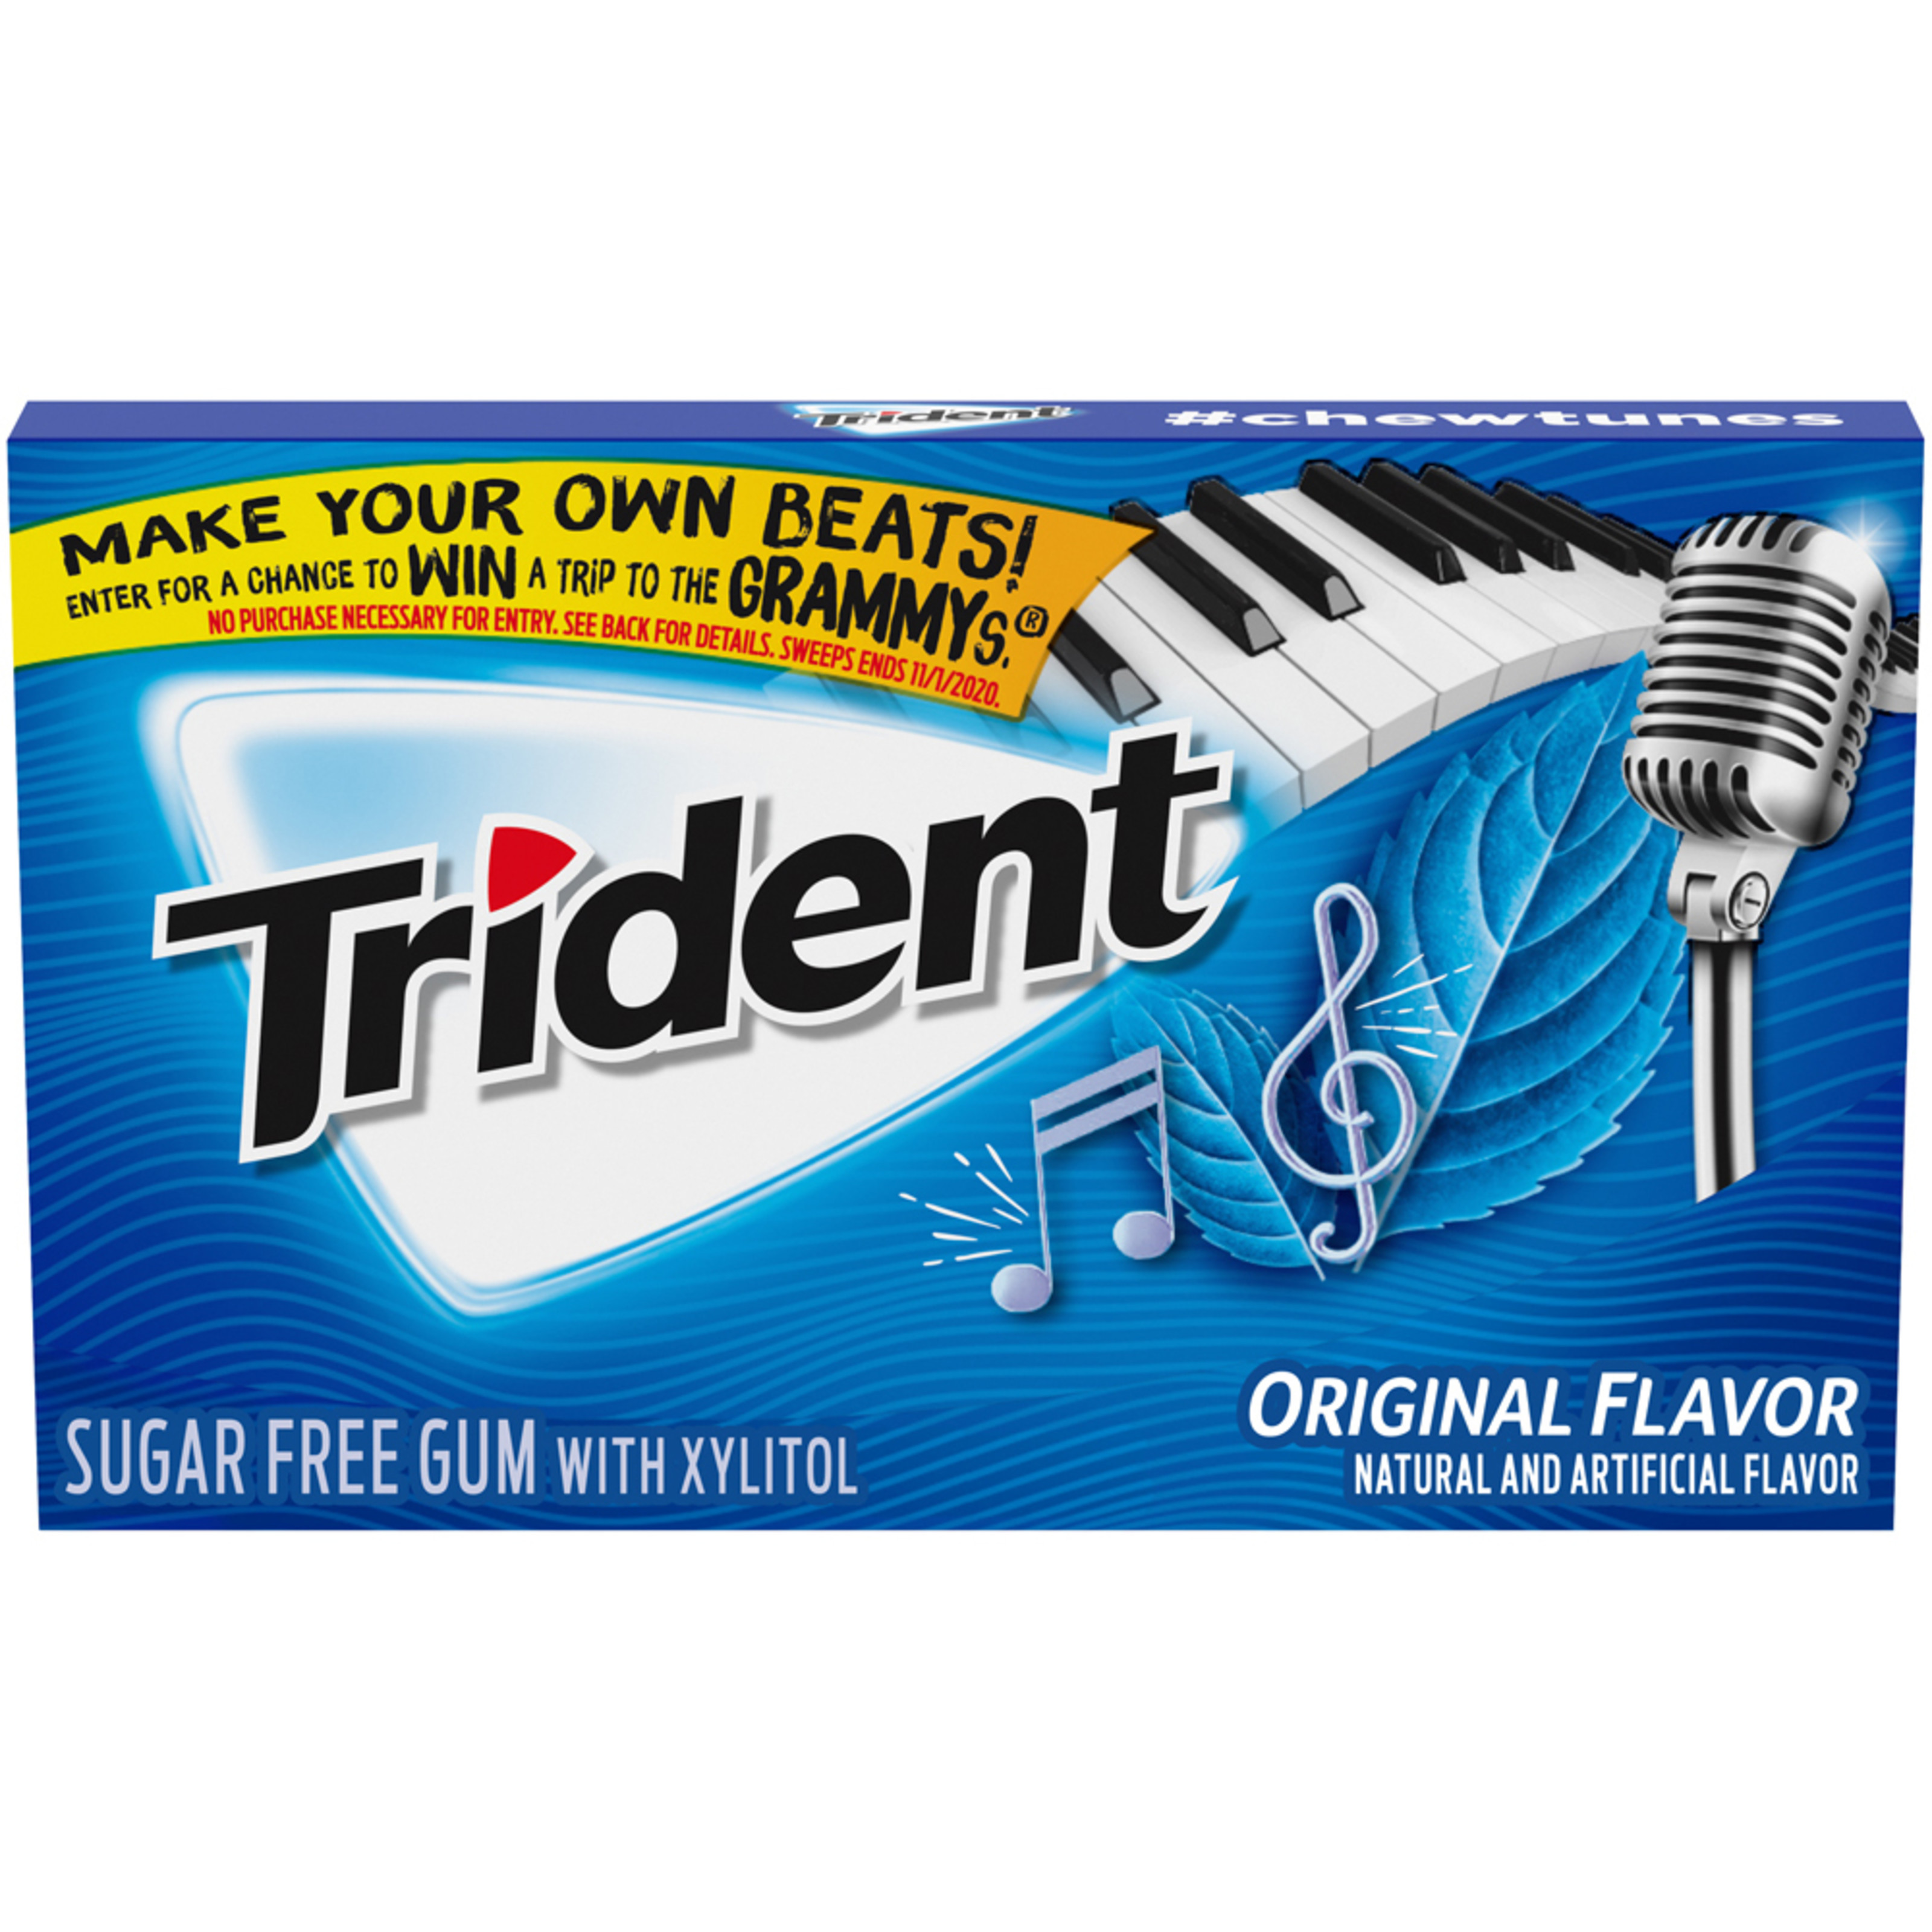 Trident Original Flavor Sugar Free Gum, 14 Piece Pack